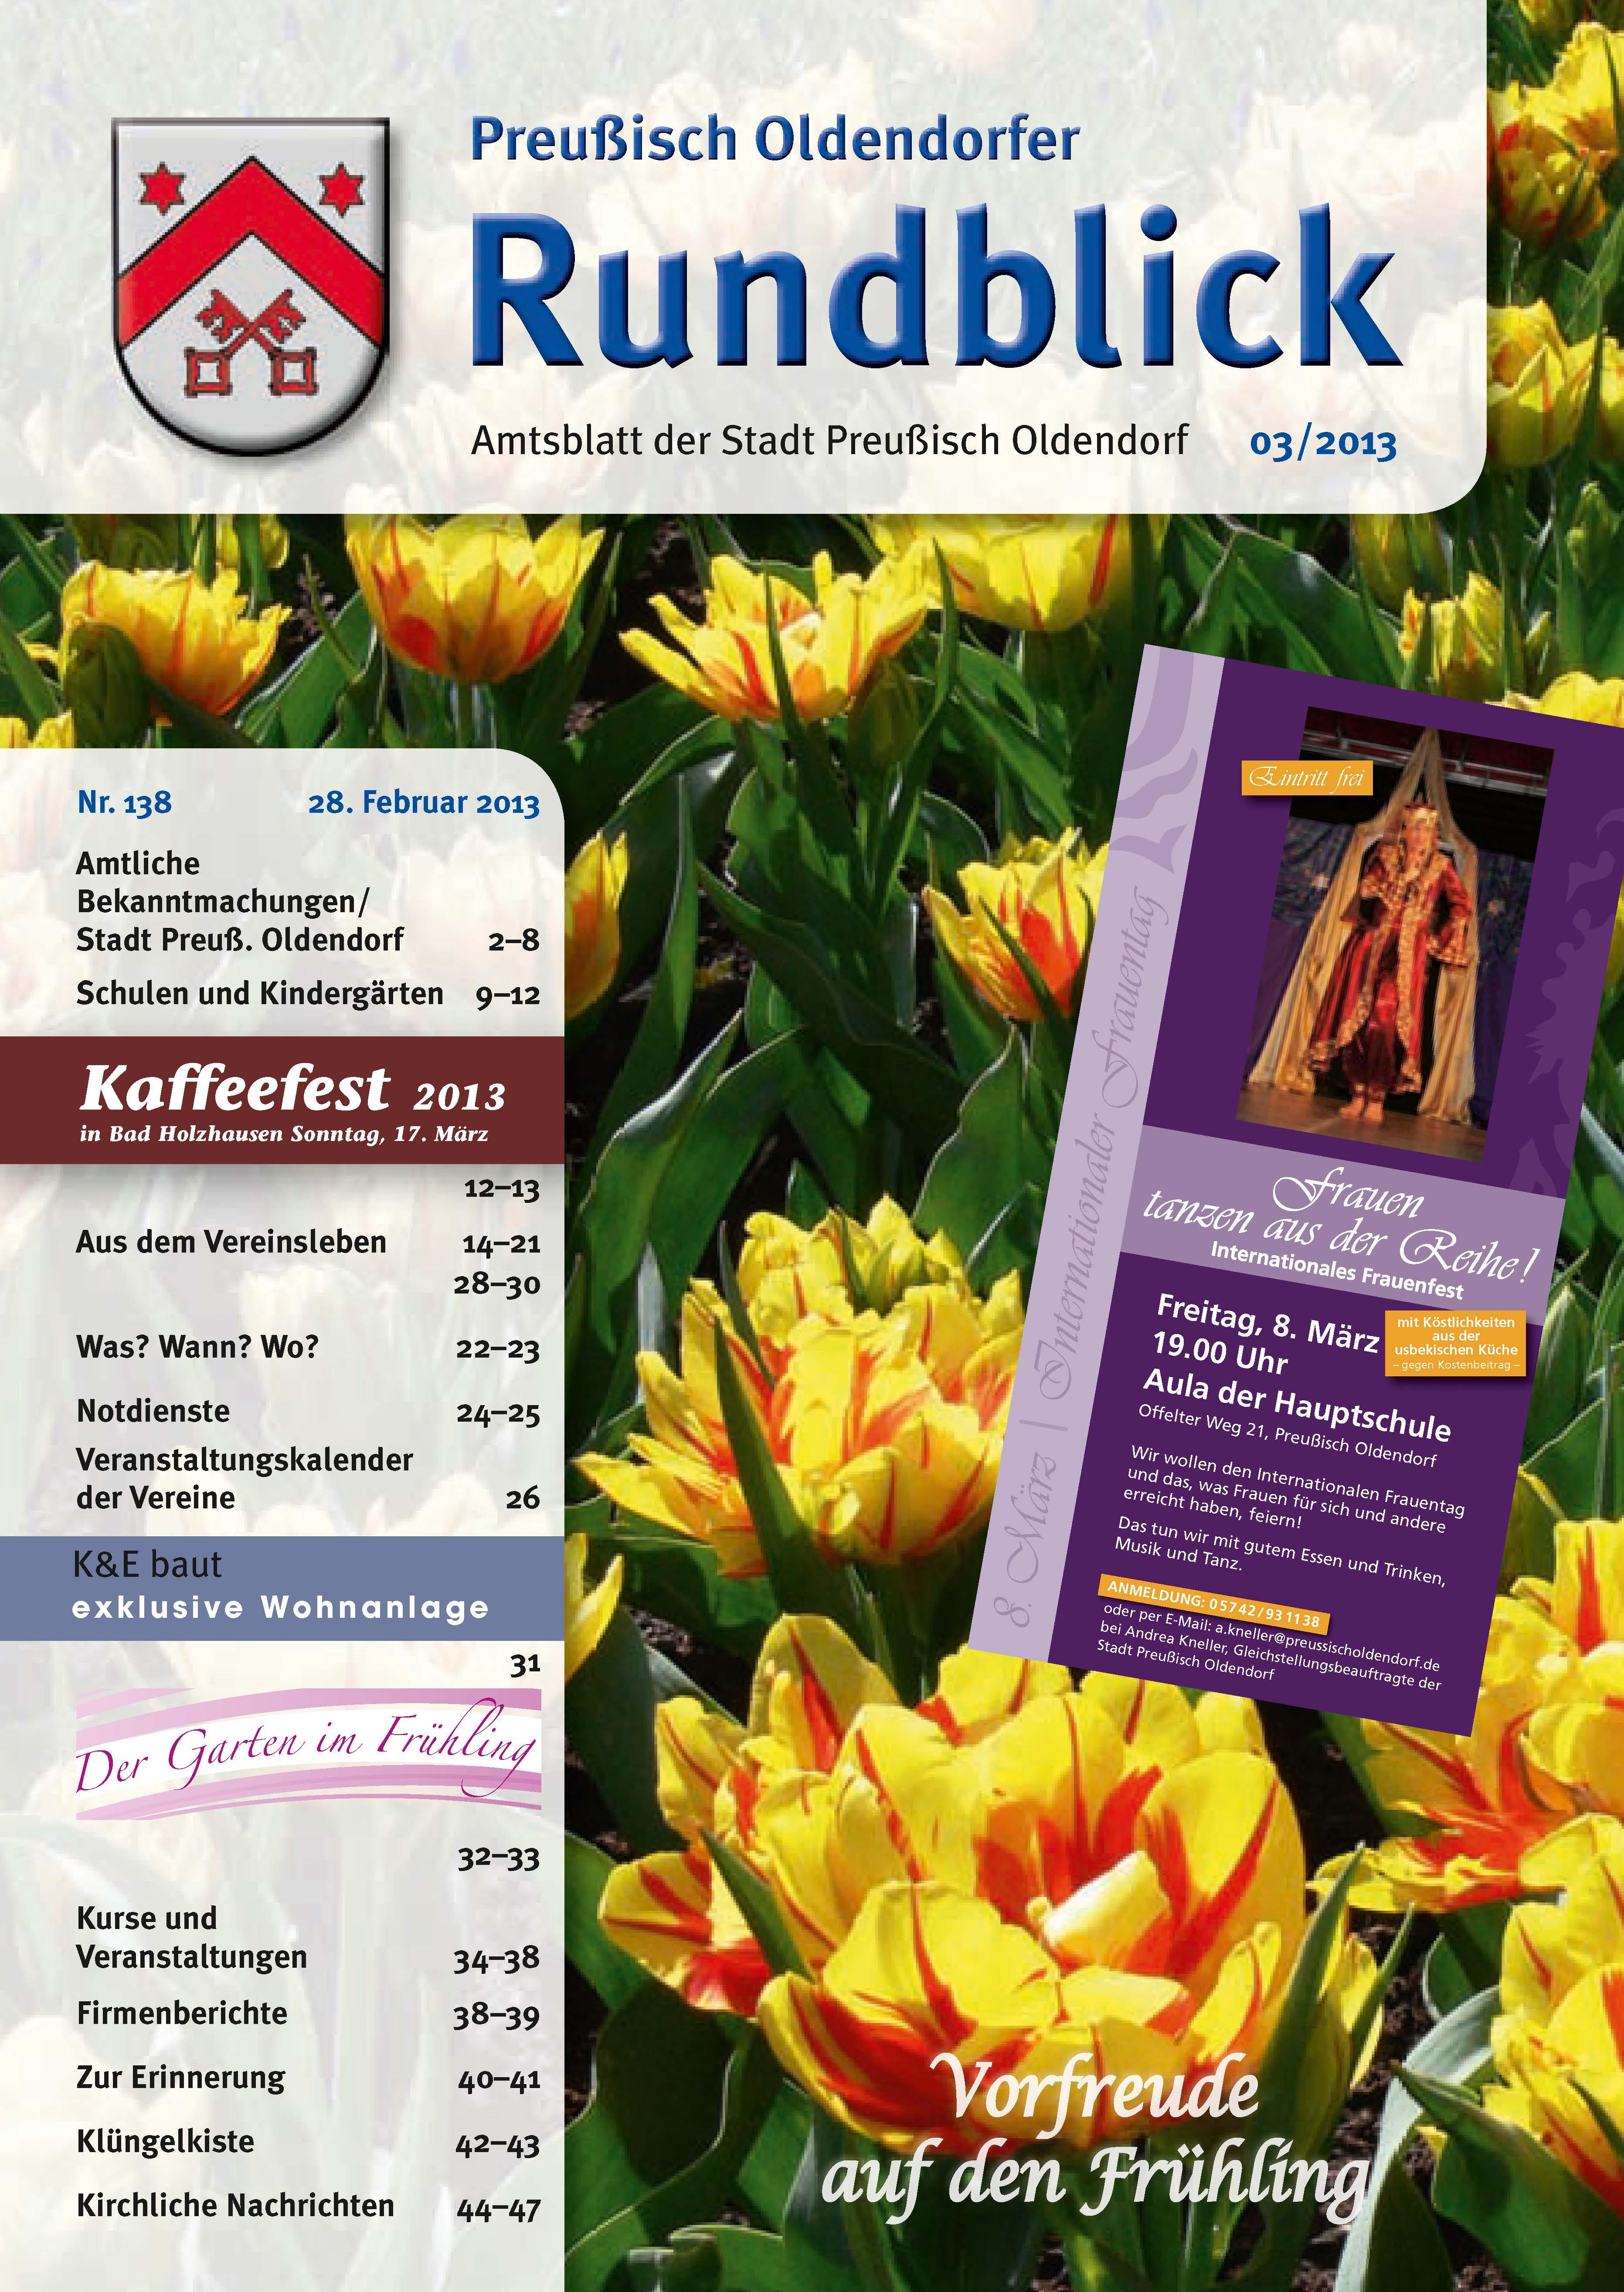 Rundblick 3-2013 Titel